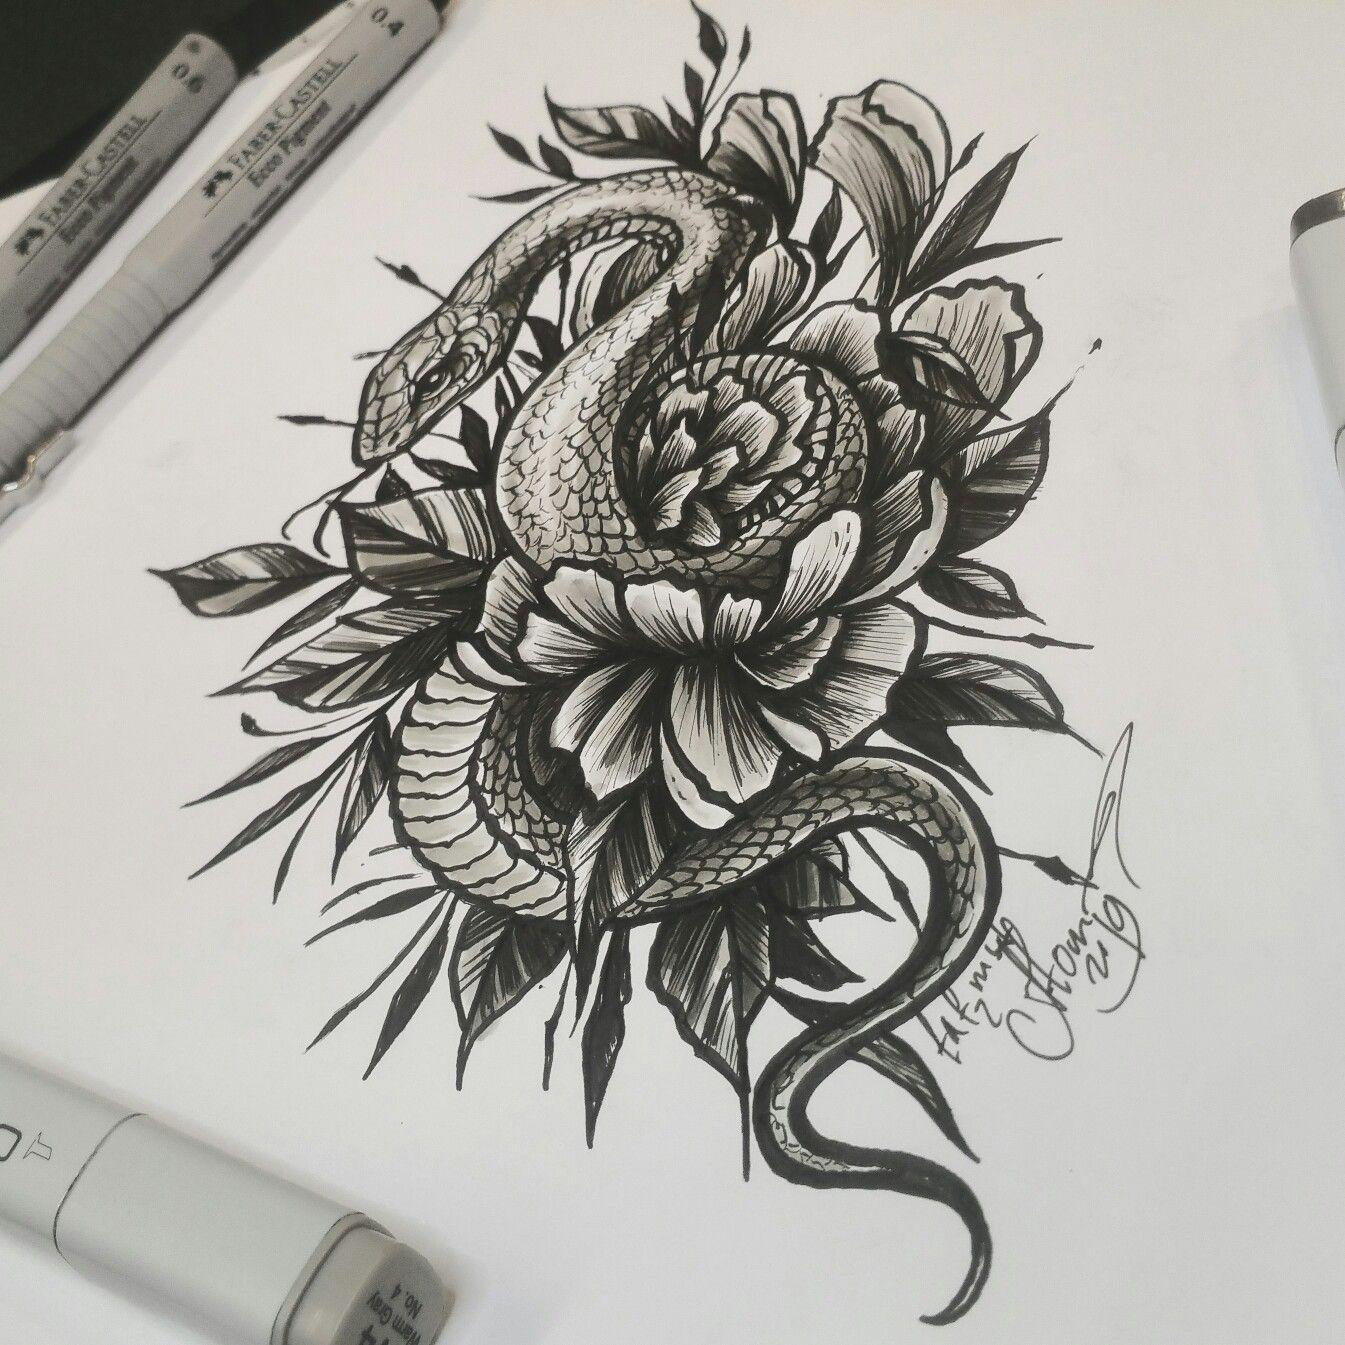 тату эскиз змея и цветок гвоздики нарисован лайнерами Faber